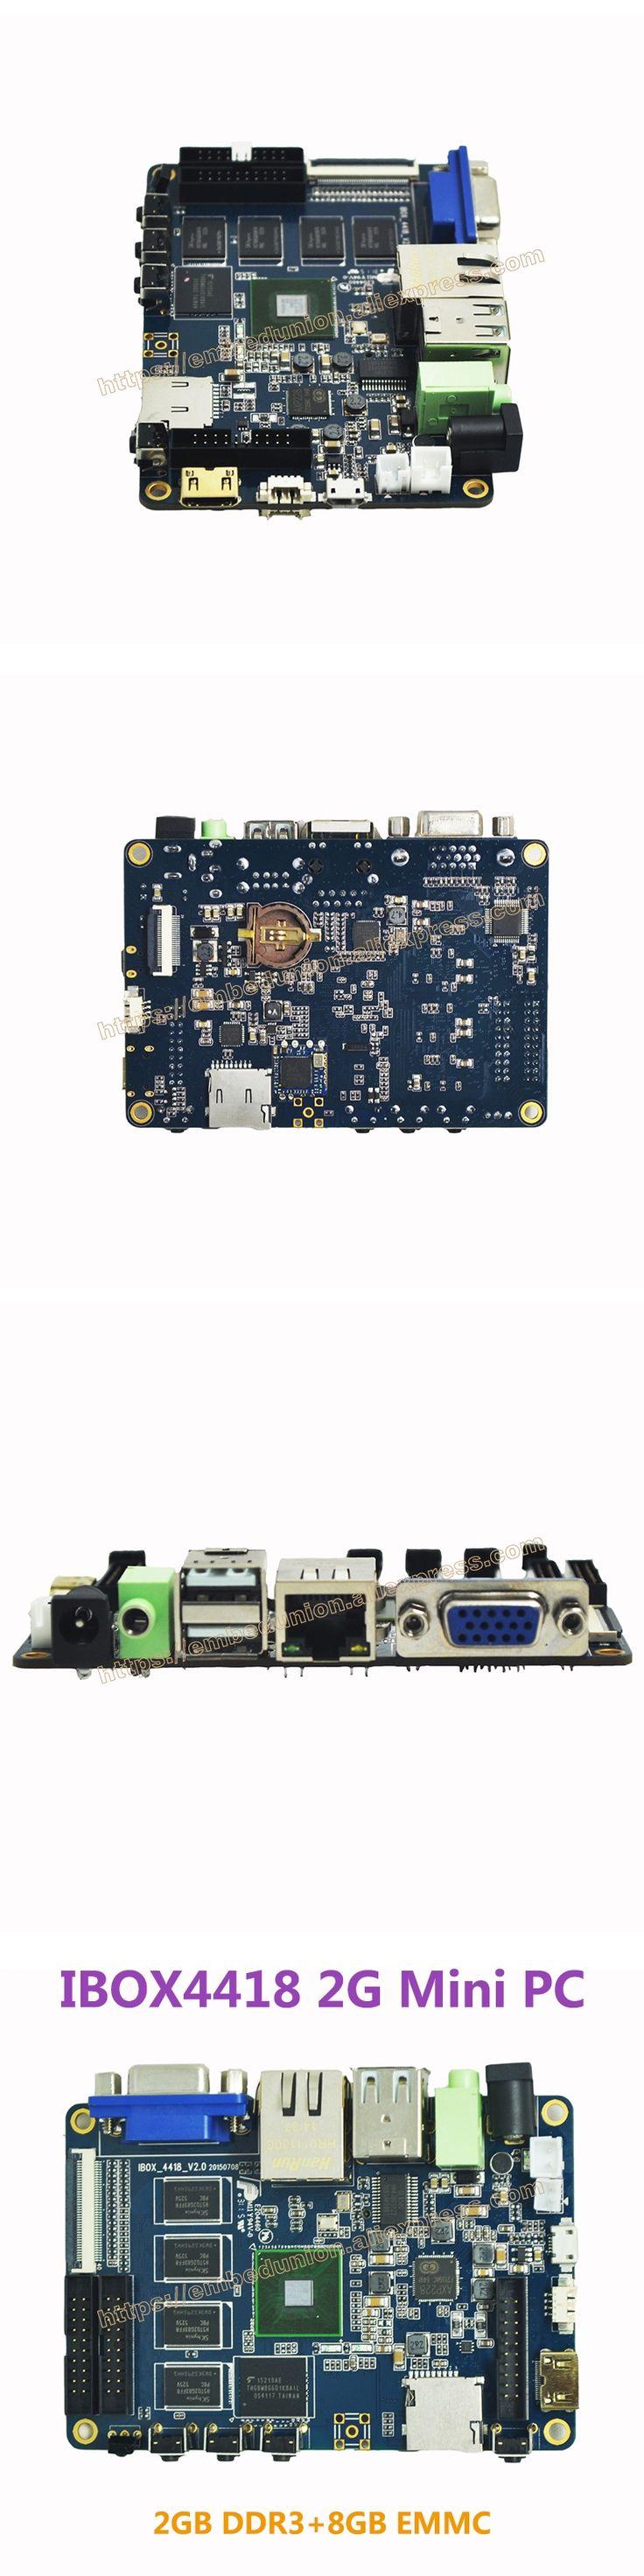 Ibox4418 2G Mini PC S5P4418 ARM Cortex-A9 Quad Core 2GB DDR3 8GB EMMC Demo Board Mini PC